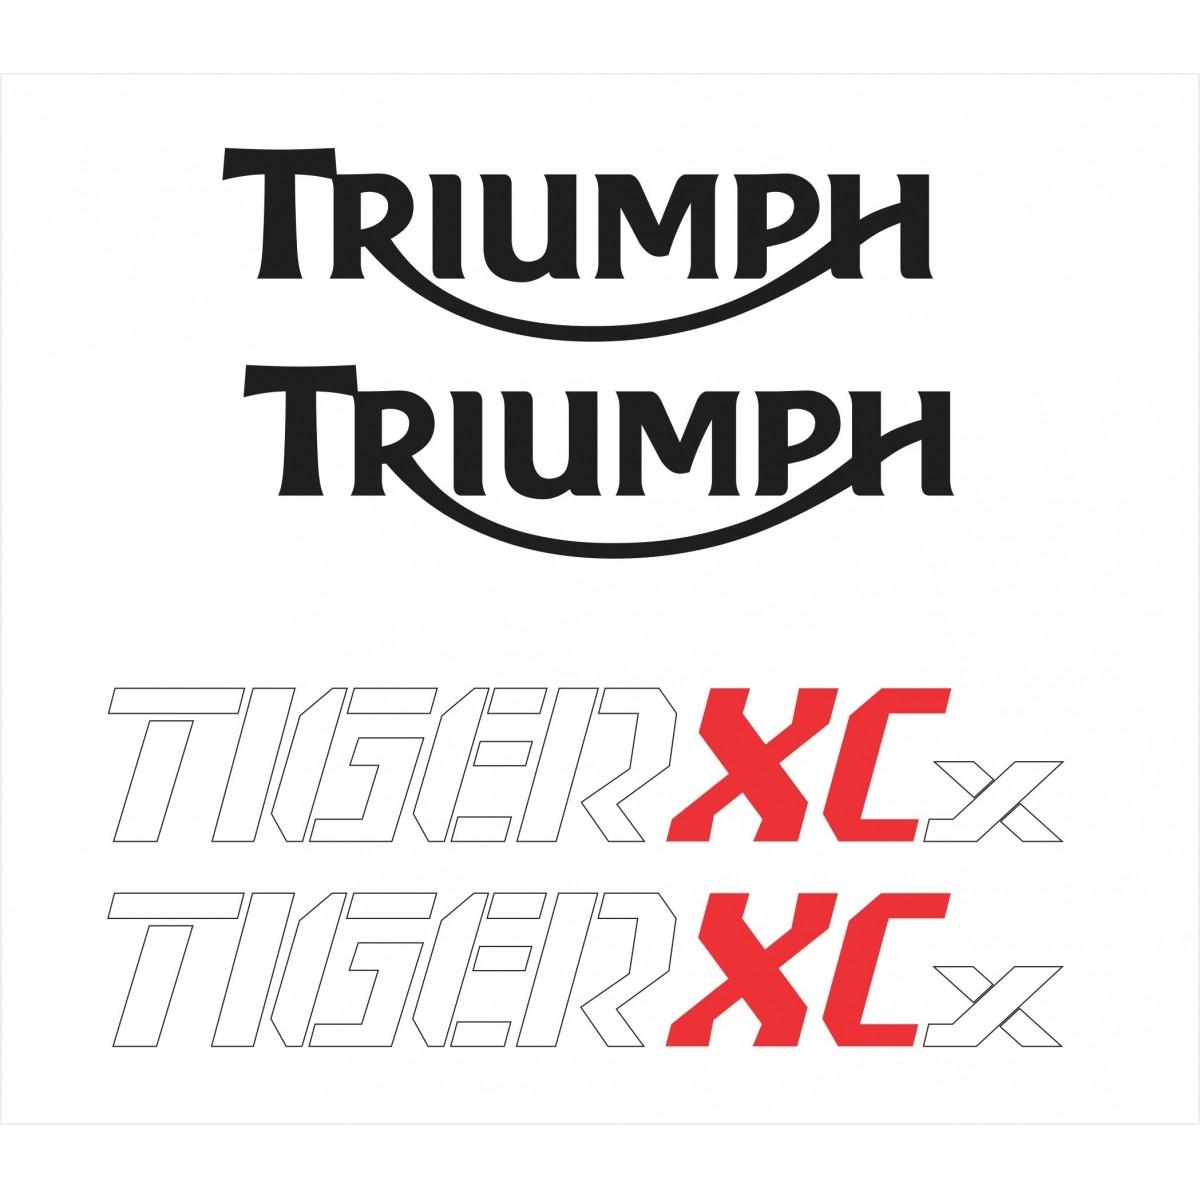 Kit Adesivo Triumph Tiger 800xcx 800 Xcx 2017 Branca Tg017